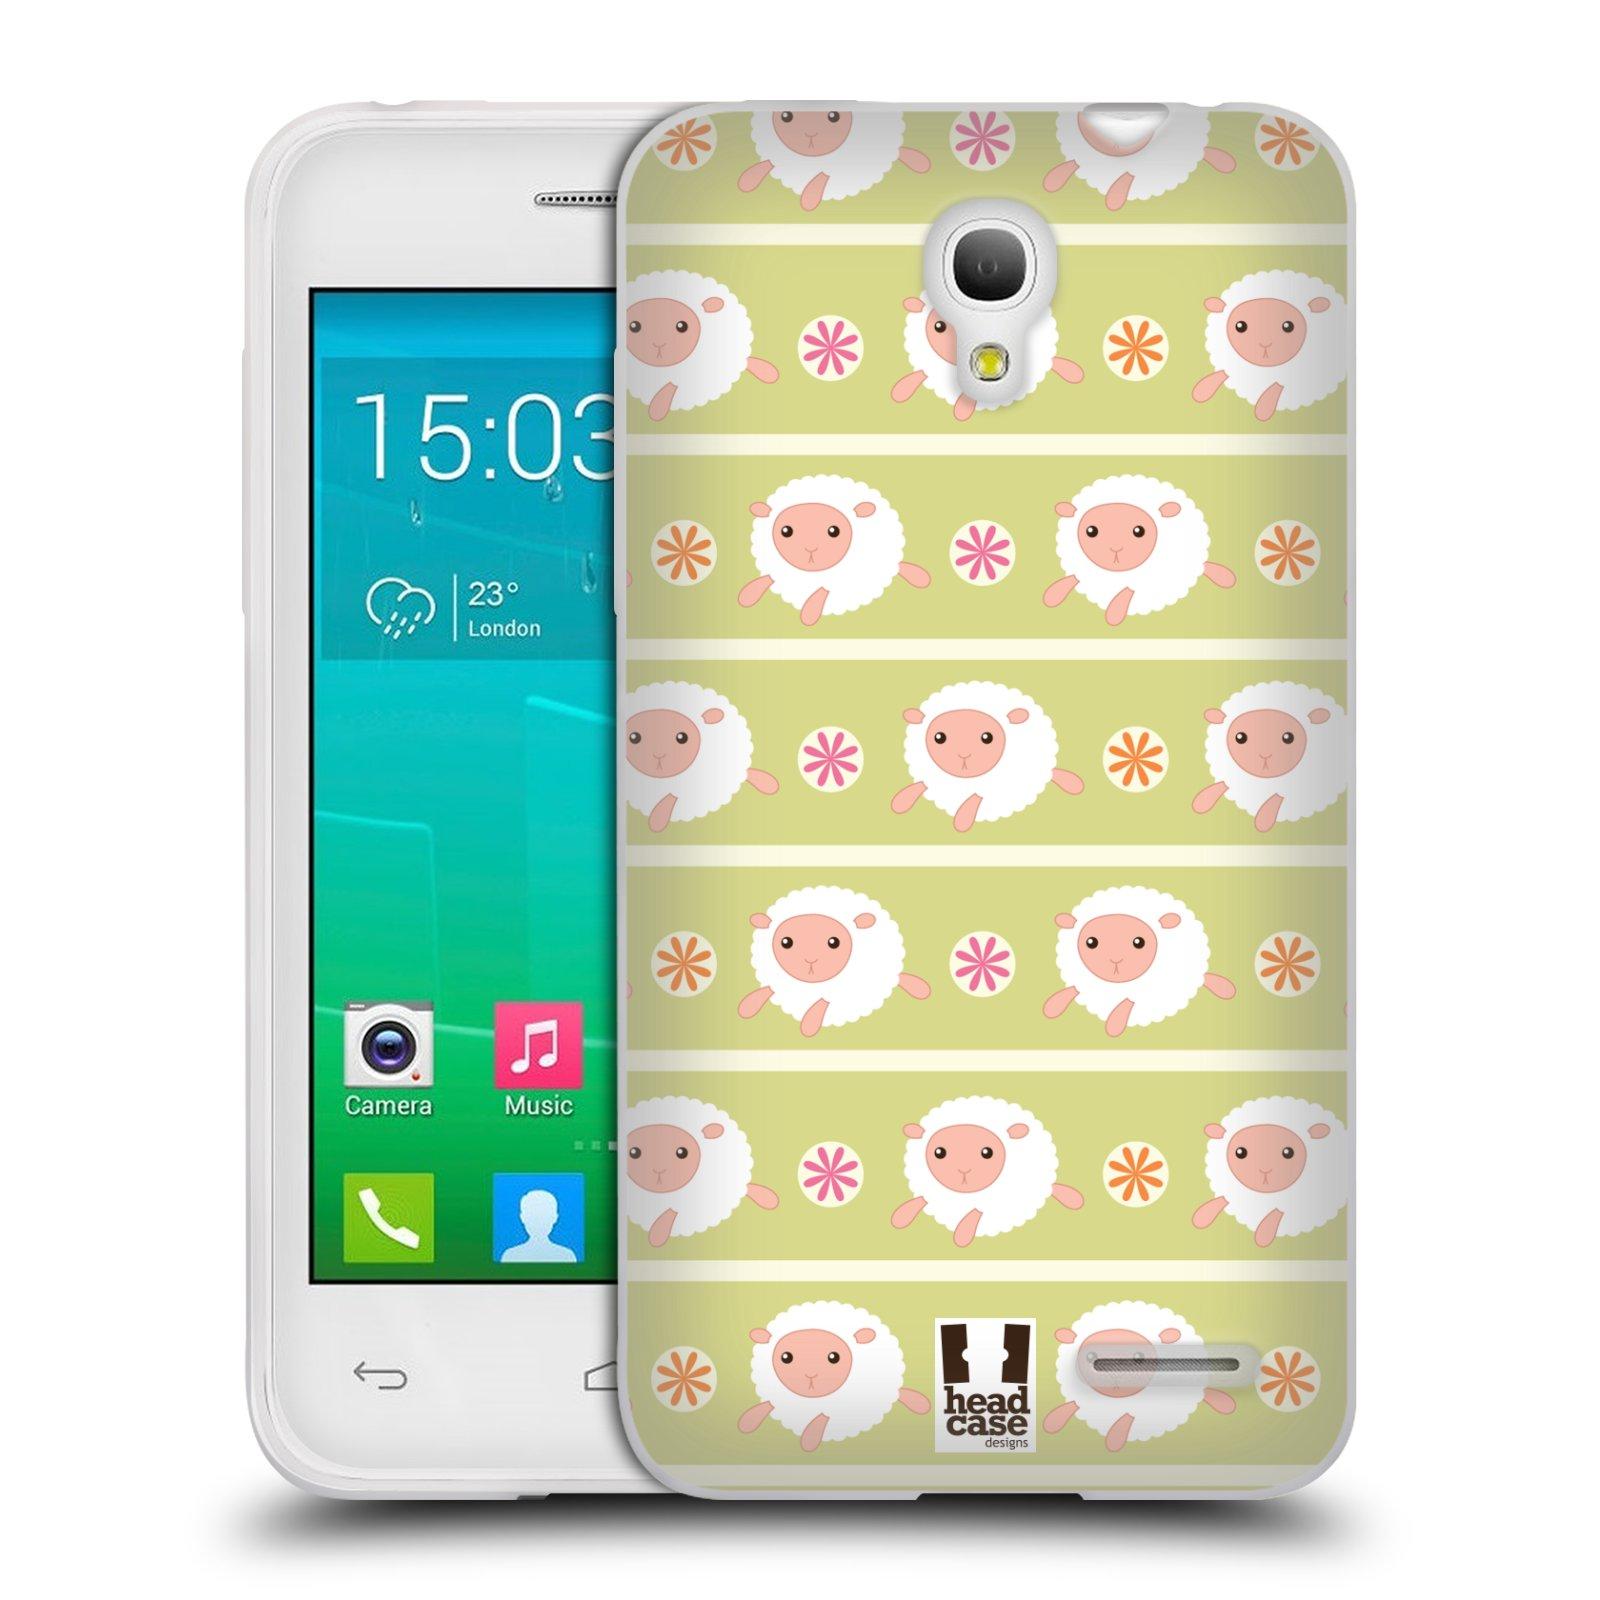 HEAD CASE silikonový obal na mobil Alcatel POP S3 OT-5050Y vzor roztomilé zvířecí vzory ovečky